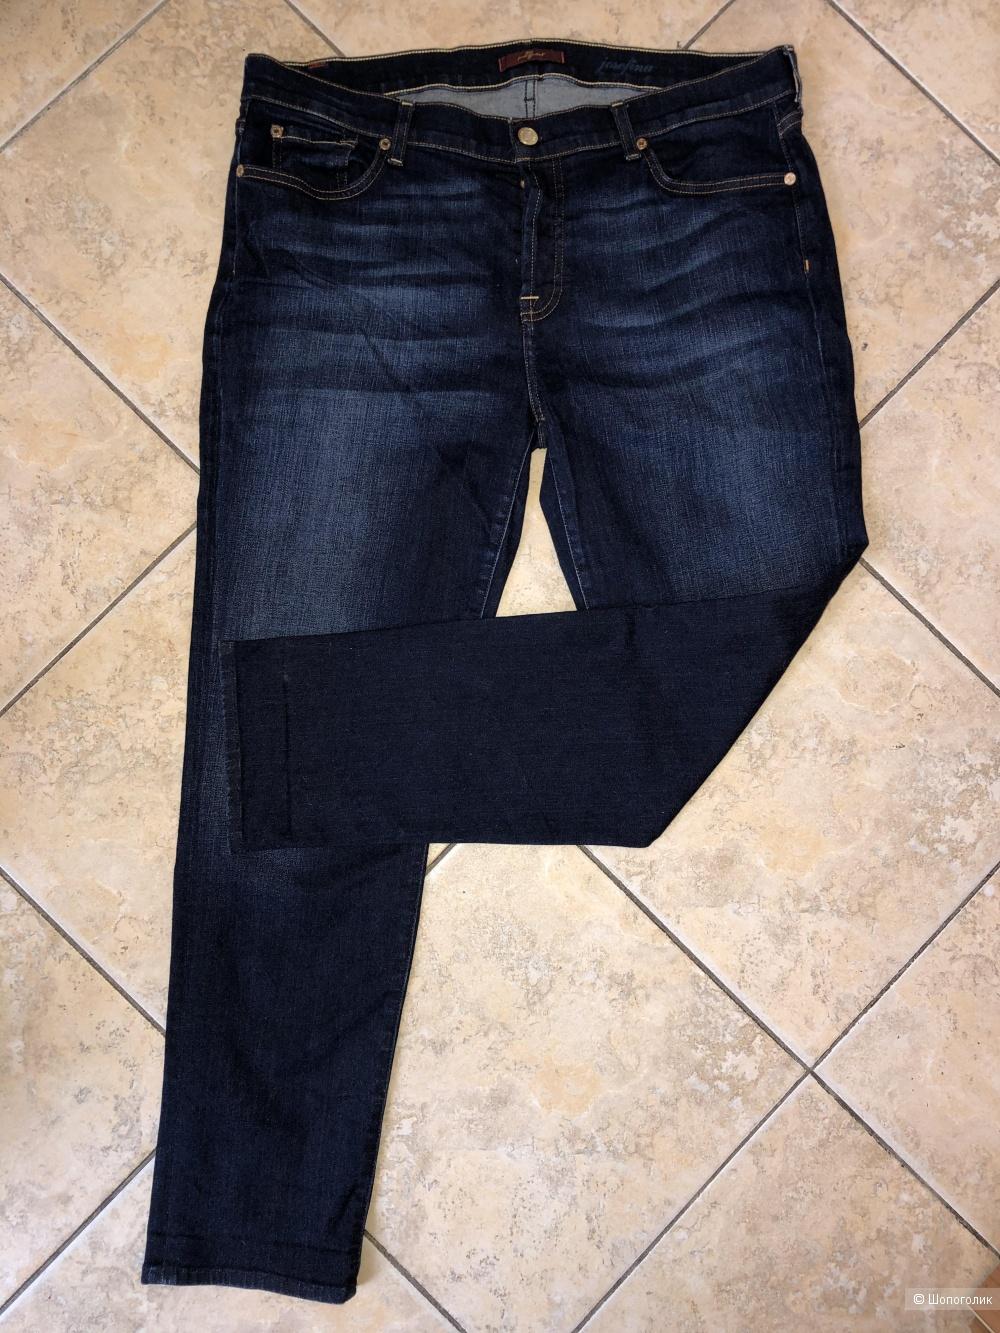 Джинсы 7 For All Mankind, размер джинсовый 31.